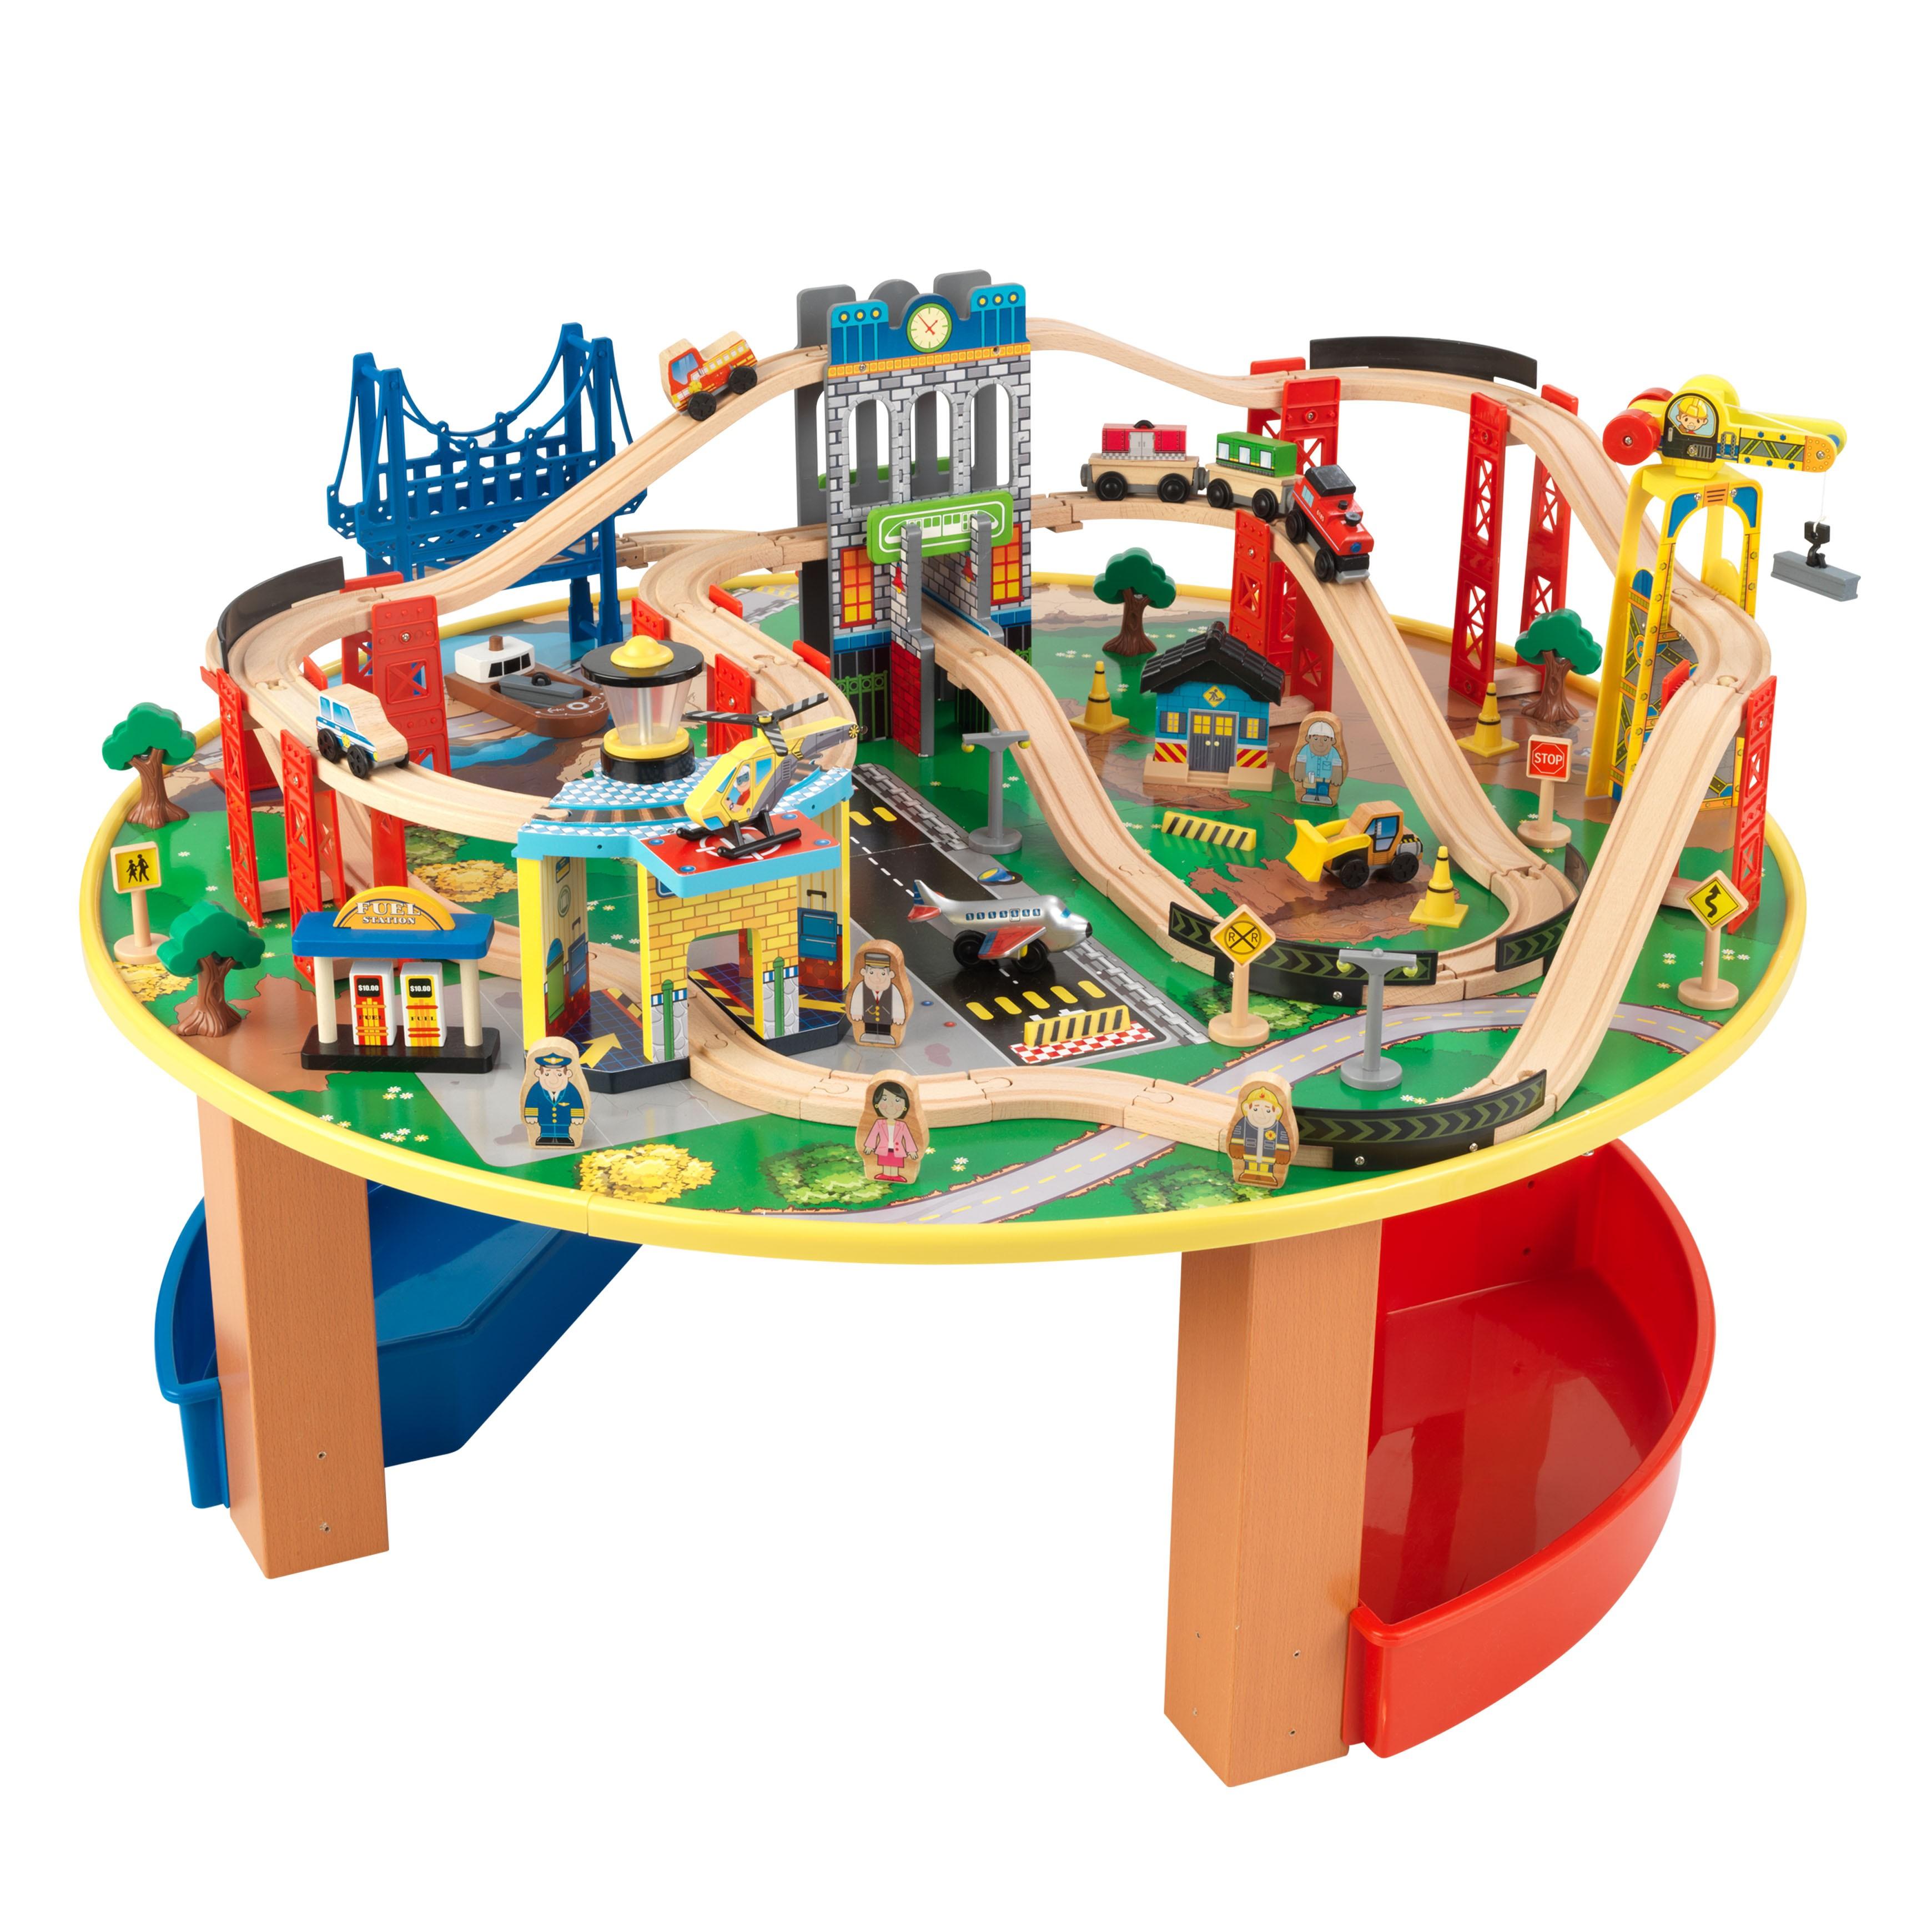 Trenulet din lemn City Explorer si masa de joaca